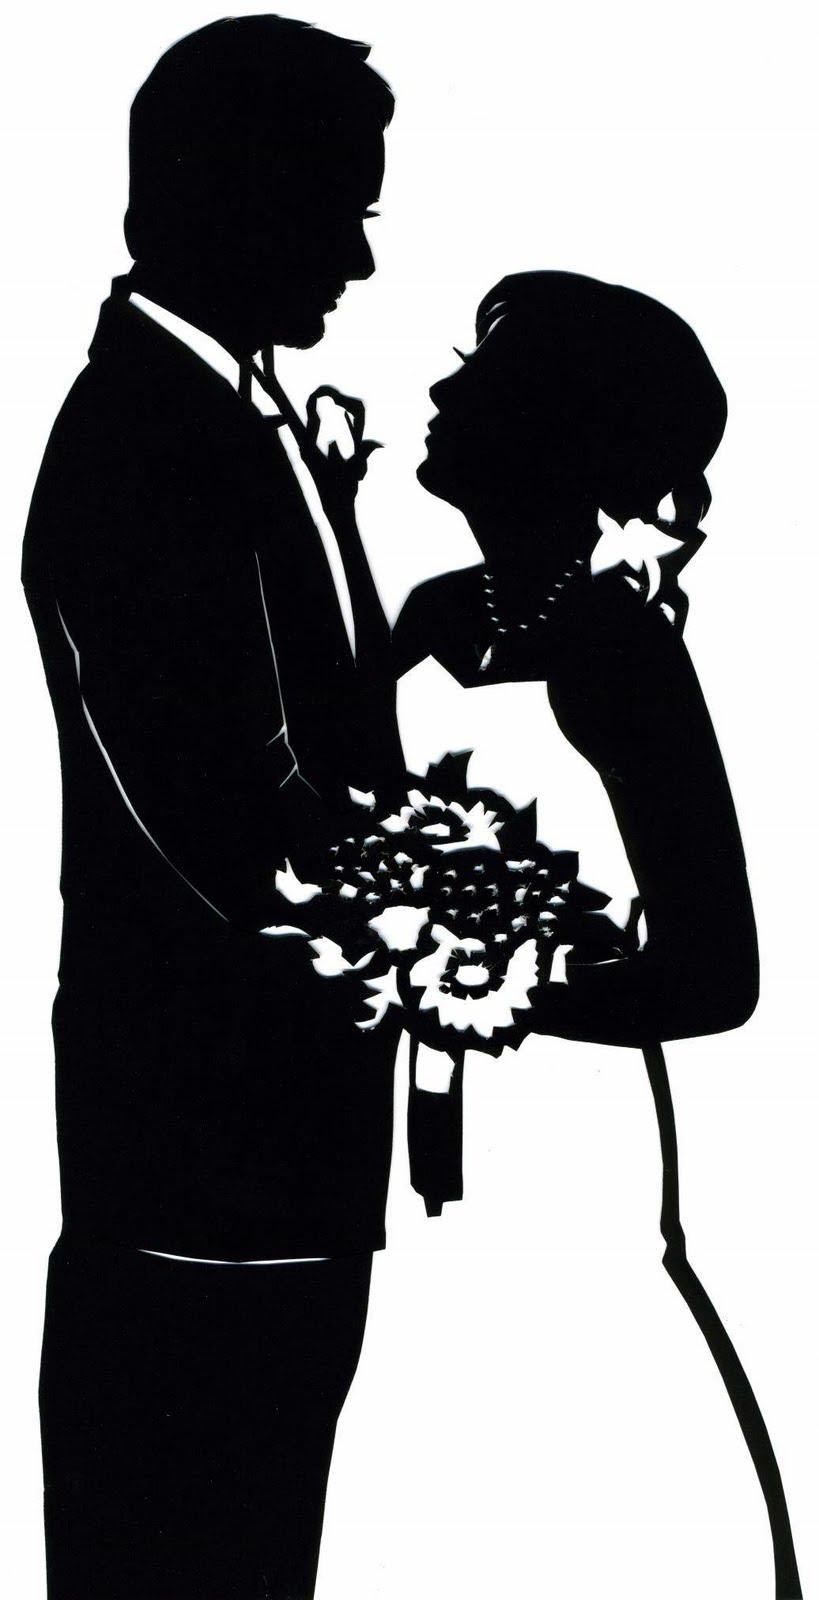 819x1600 Wedding Silhouette.jpg